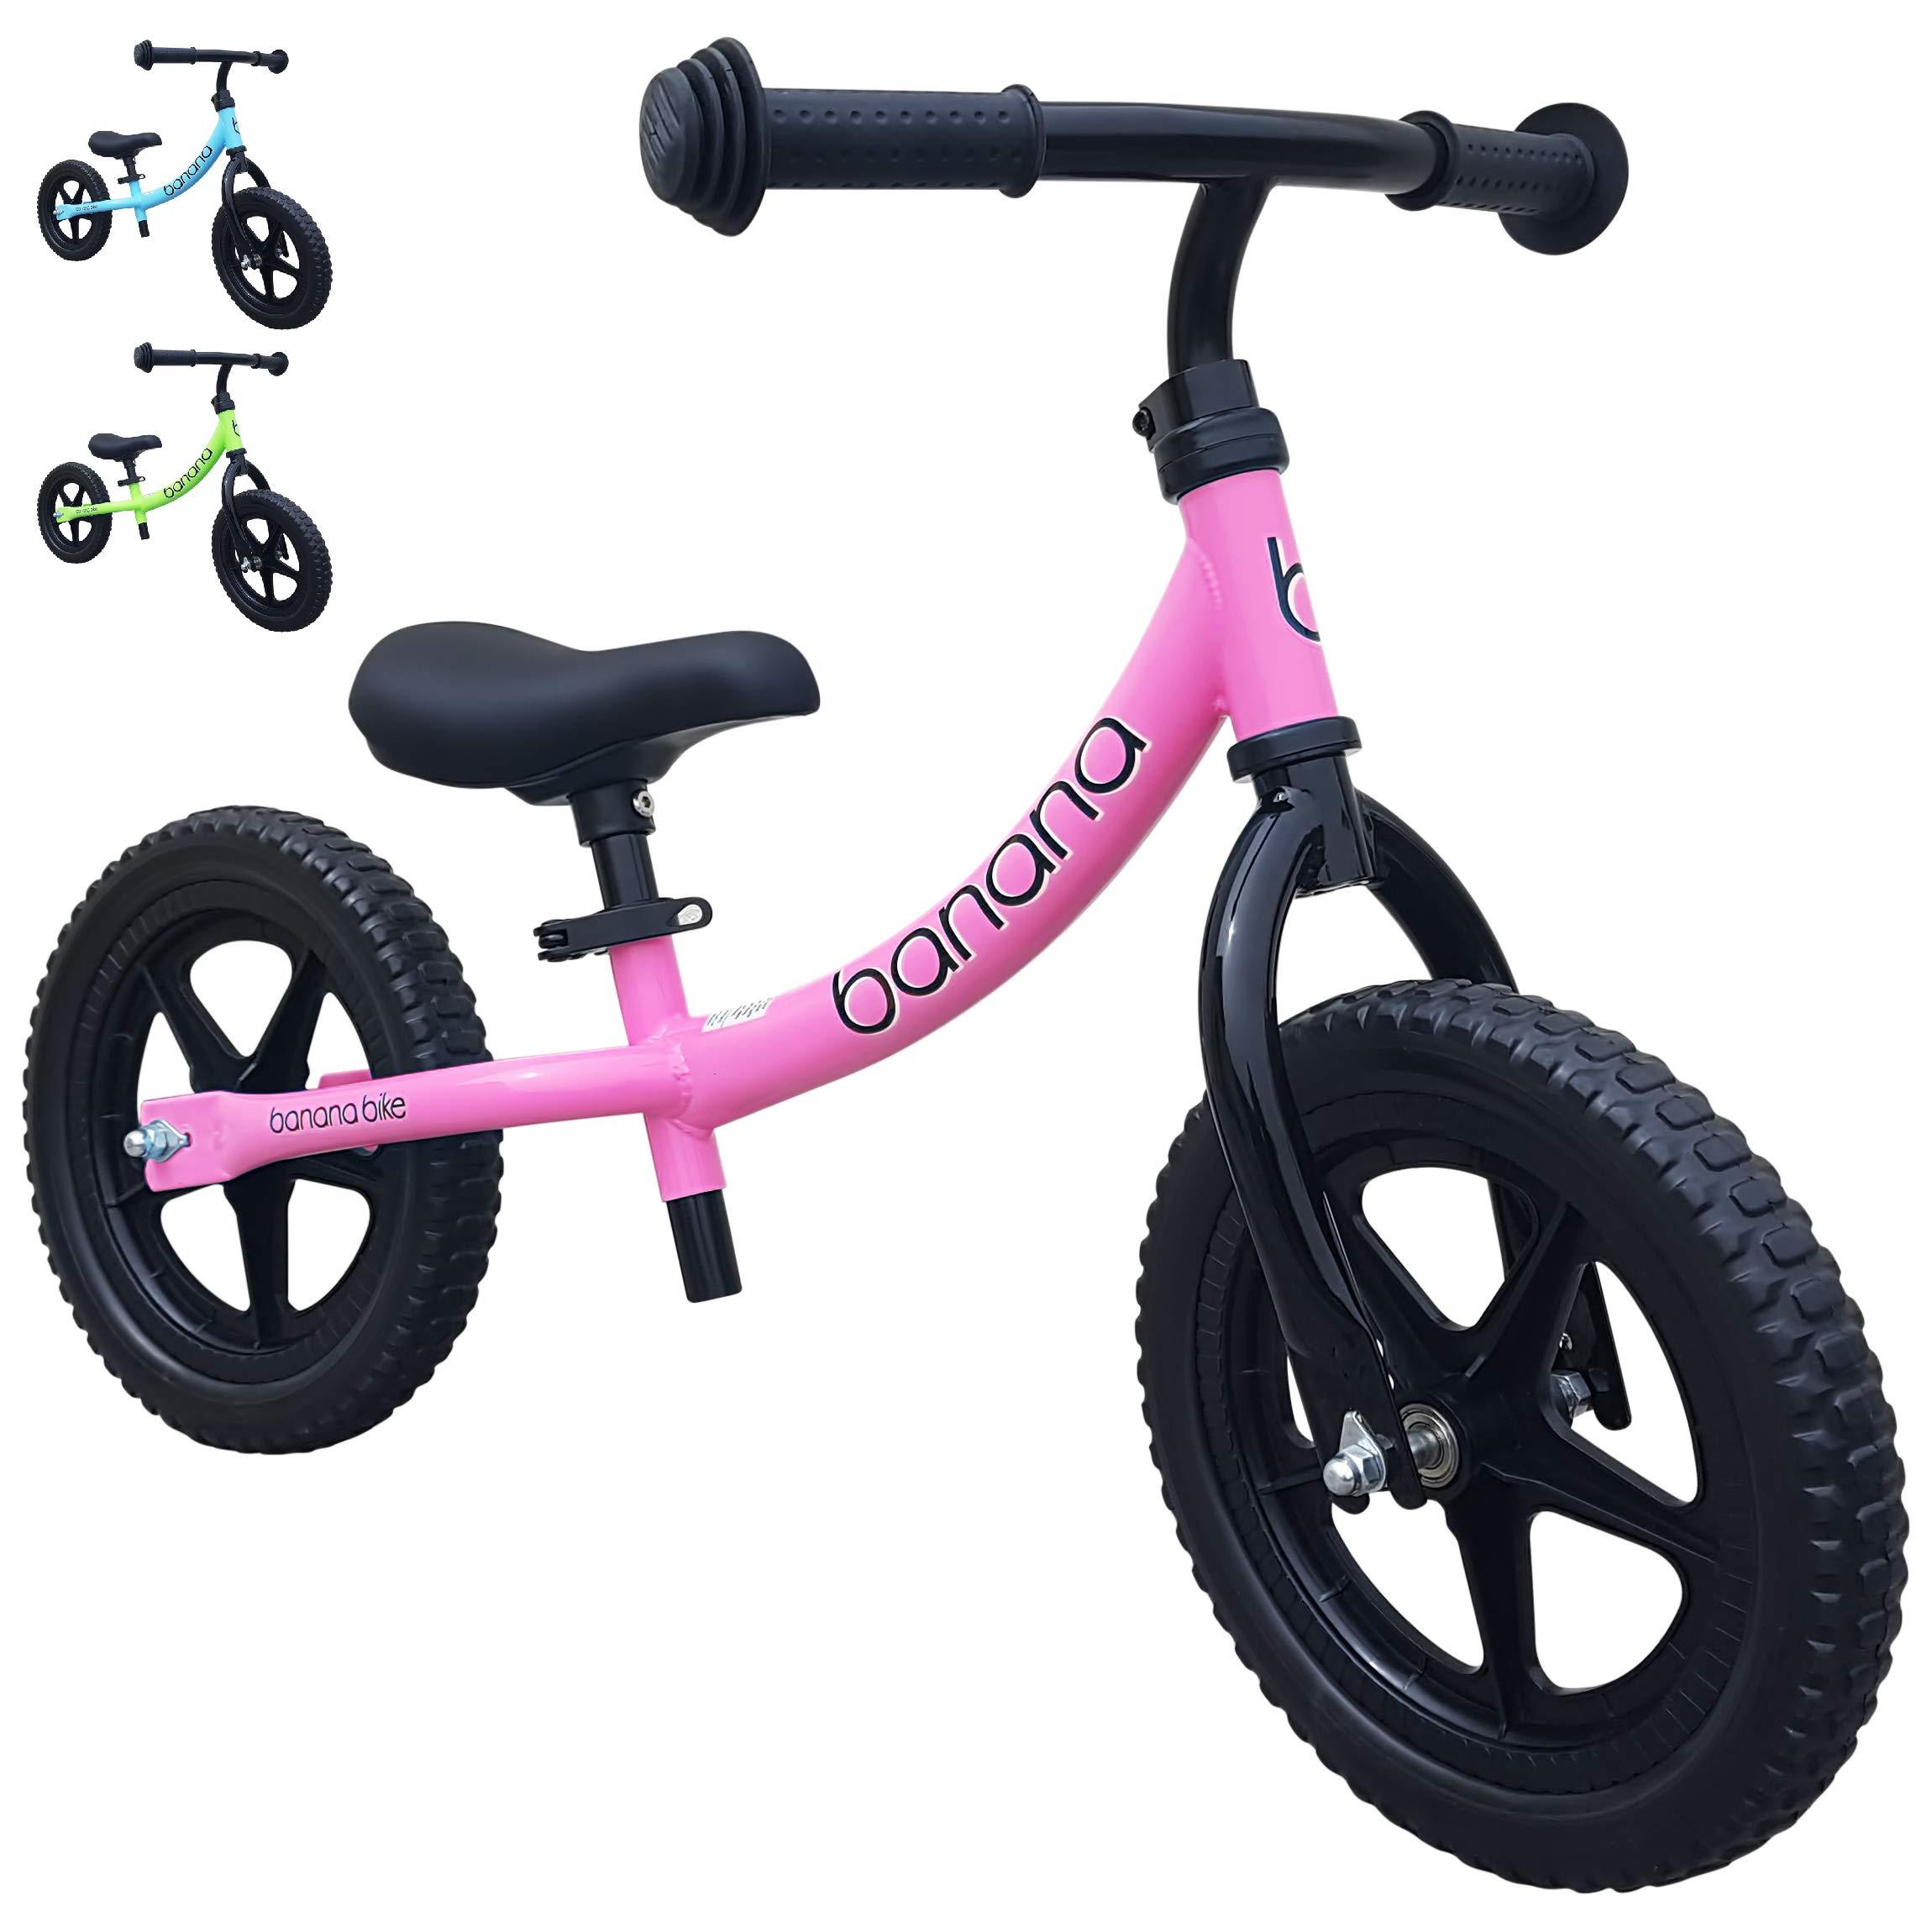 Banana Bike LT - Lightweight Balance Bike for Toddlers, Kids - 2, 3, 4 Year Olds (Pink 2019) by Banana Bike